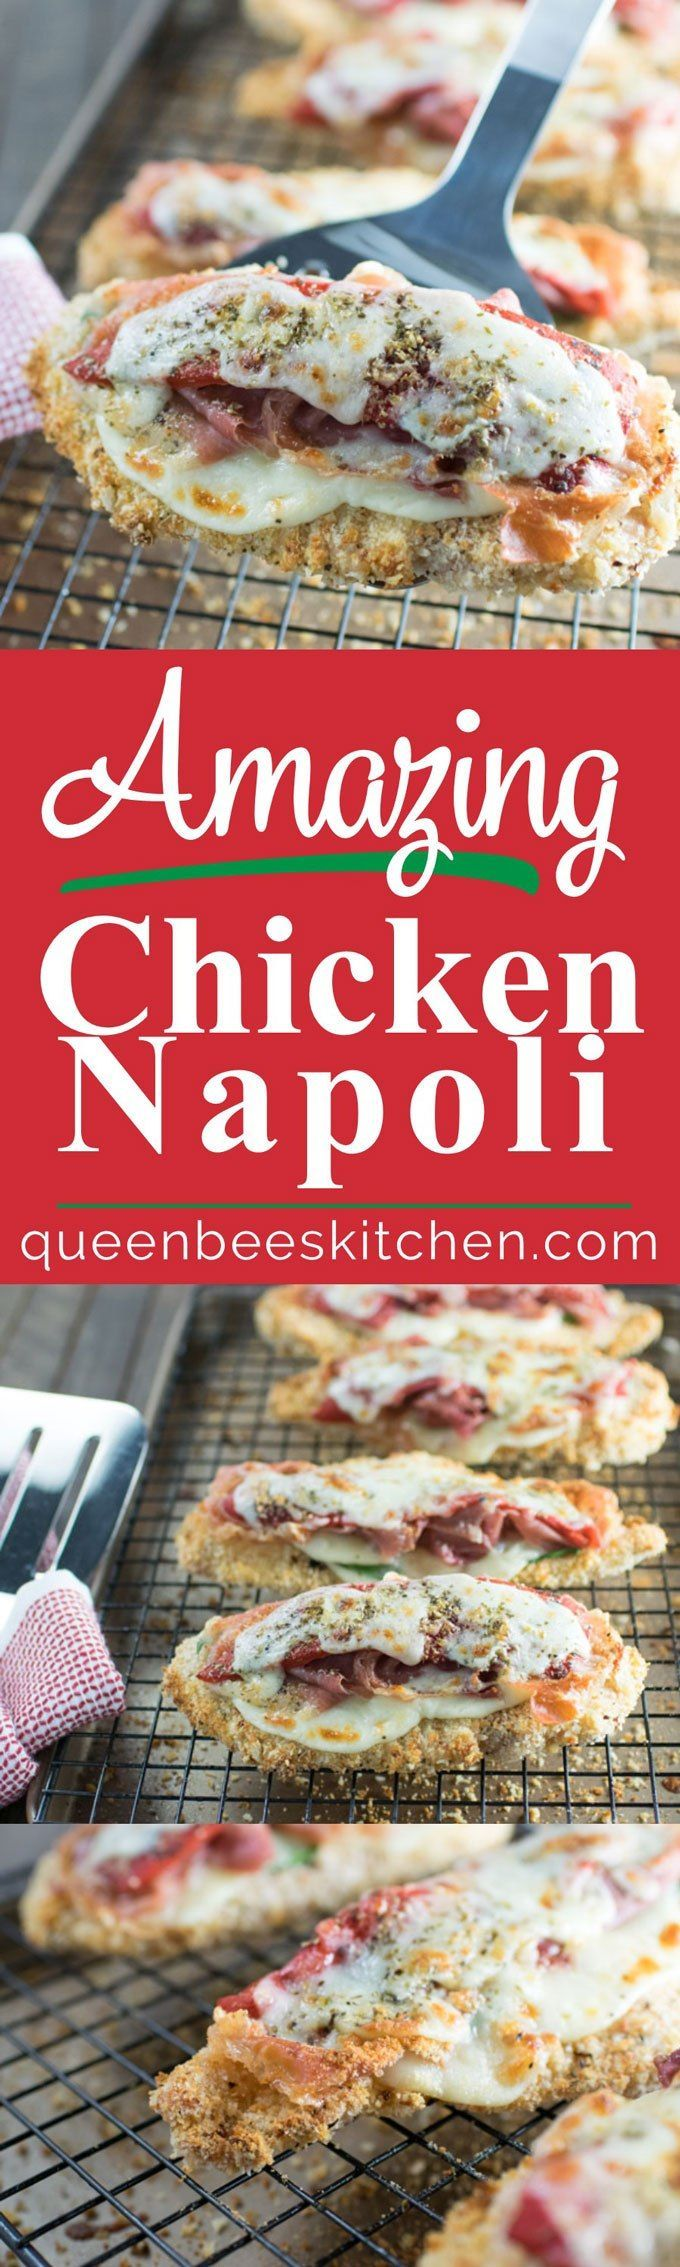 Amazing Chicken Napoli